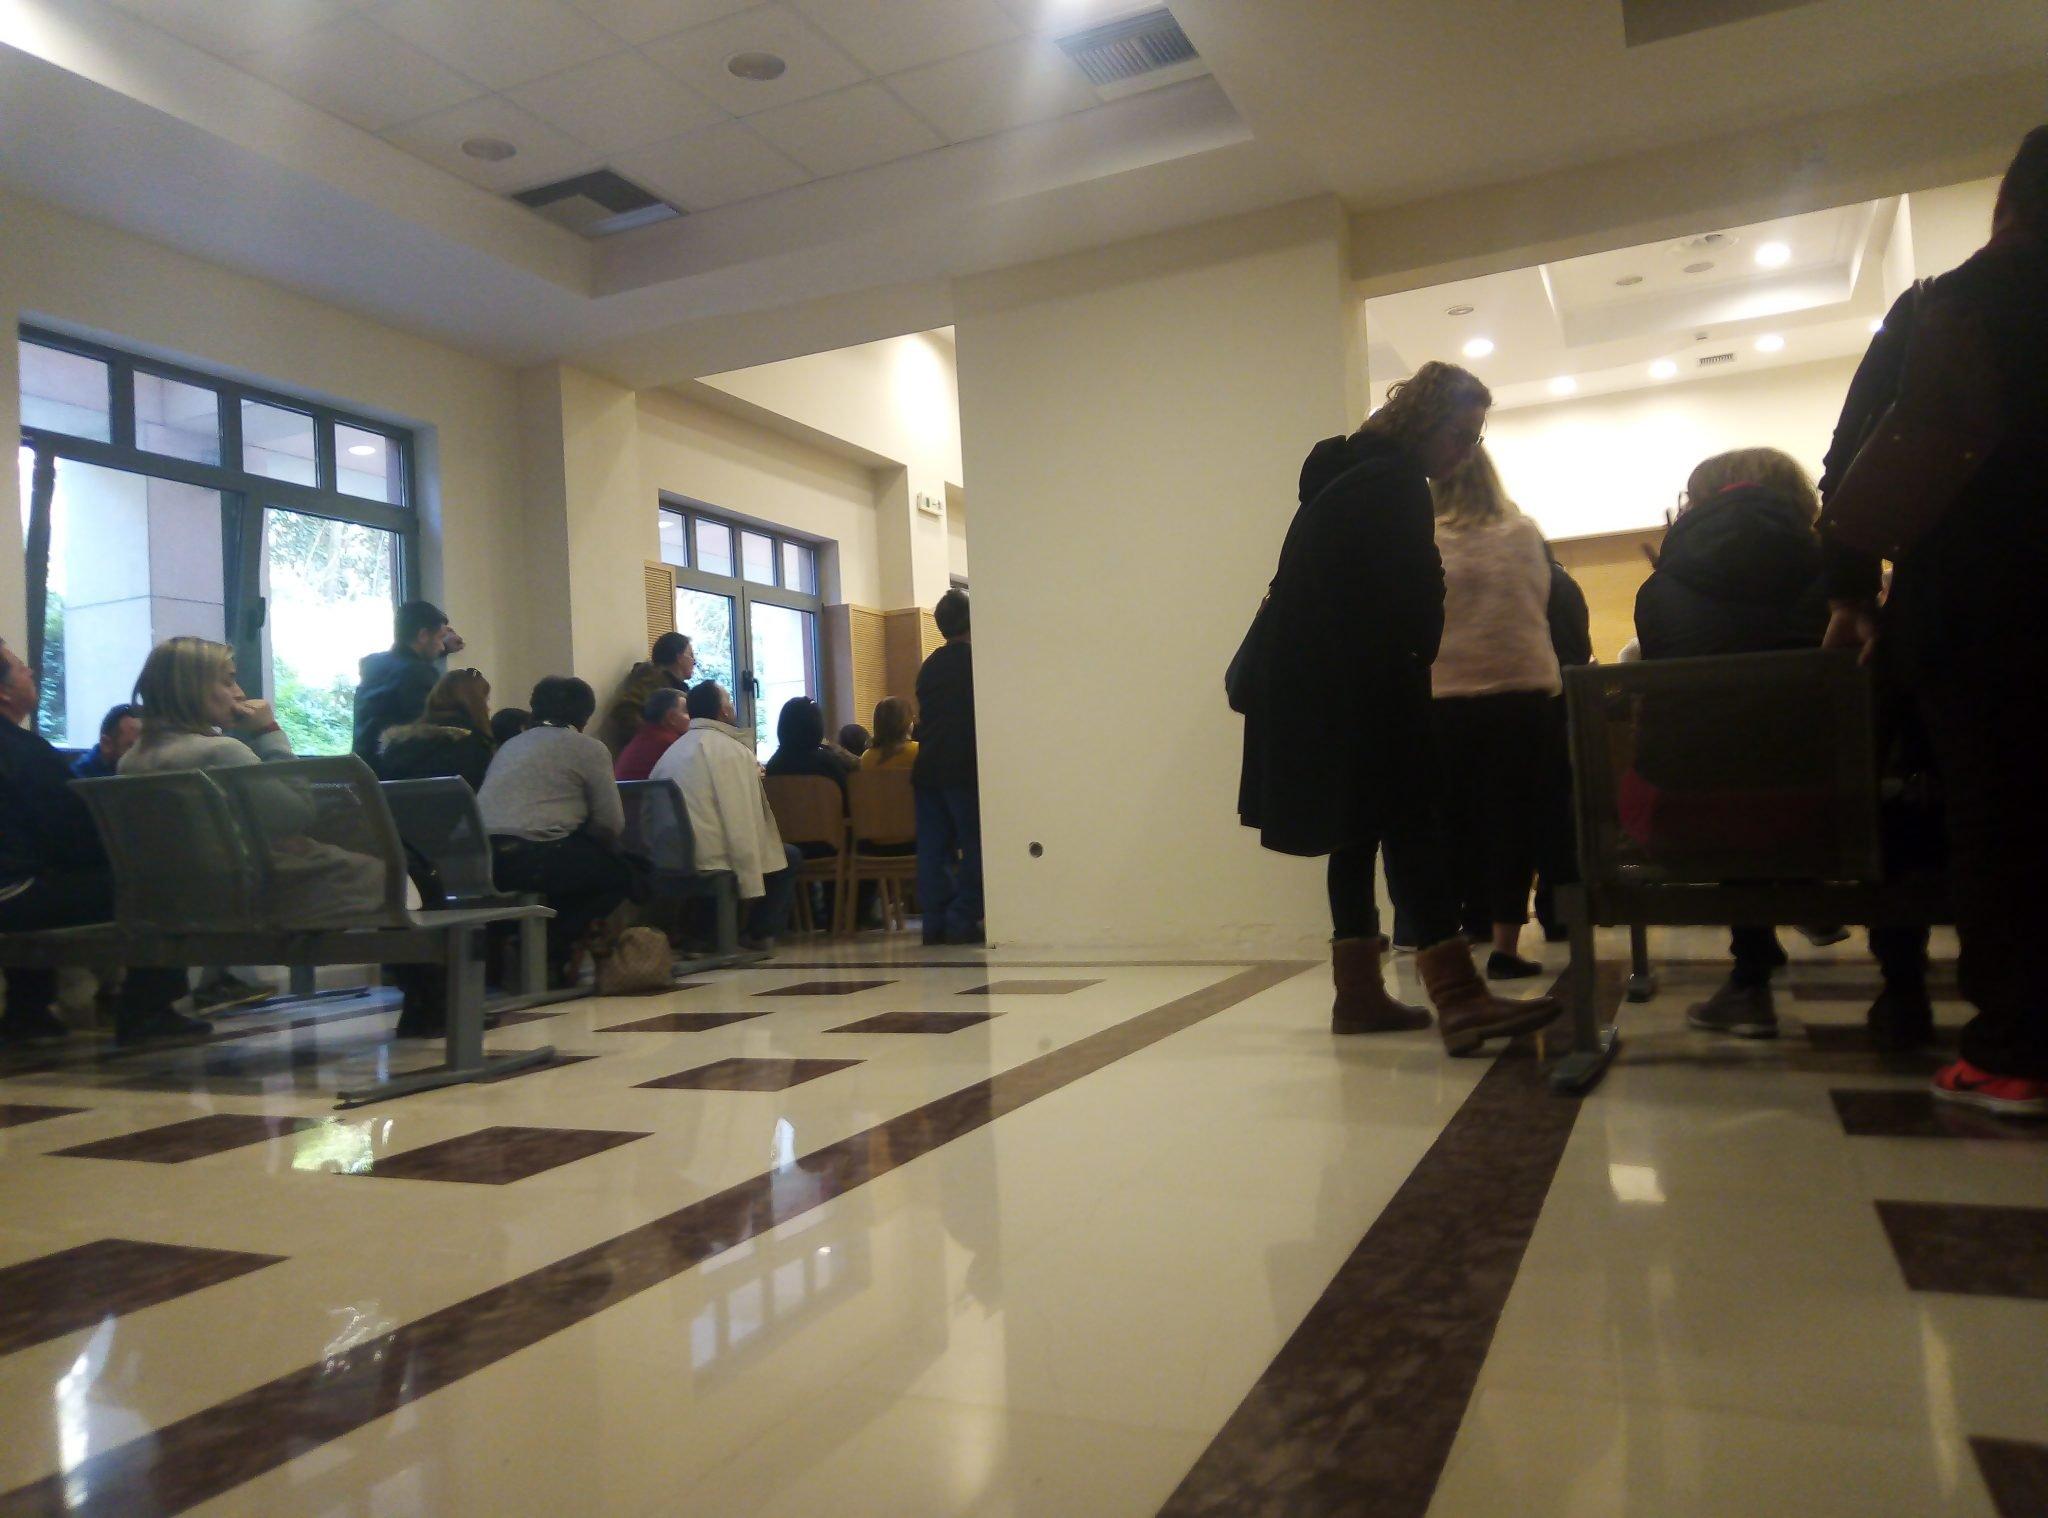 Photo of 6 μηνες για διαταραξη υπηρεσίας με αναστολή και αθώοι για την βιαιοπραγια οι 3 κατοικοι της Λευκίμμης.